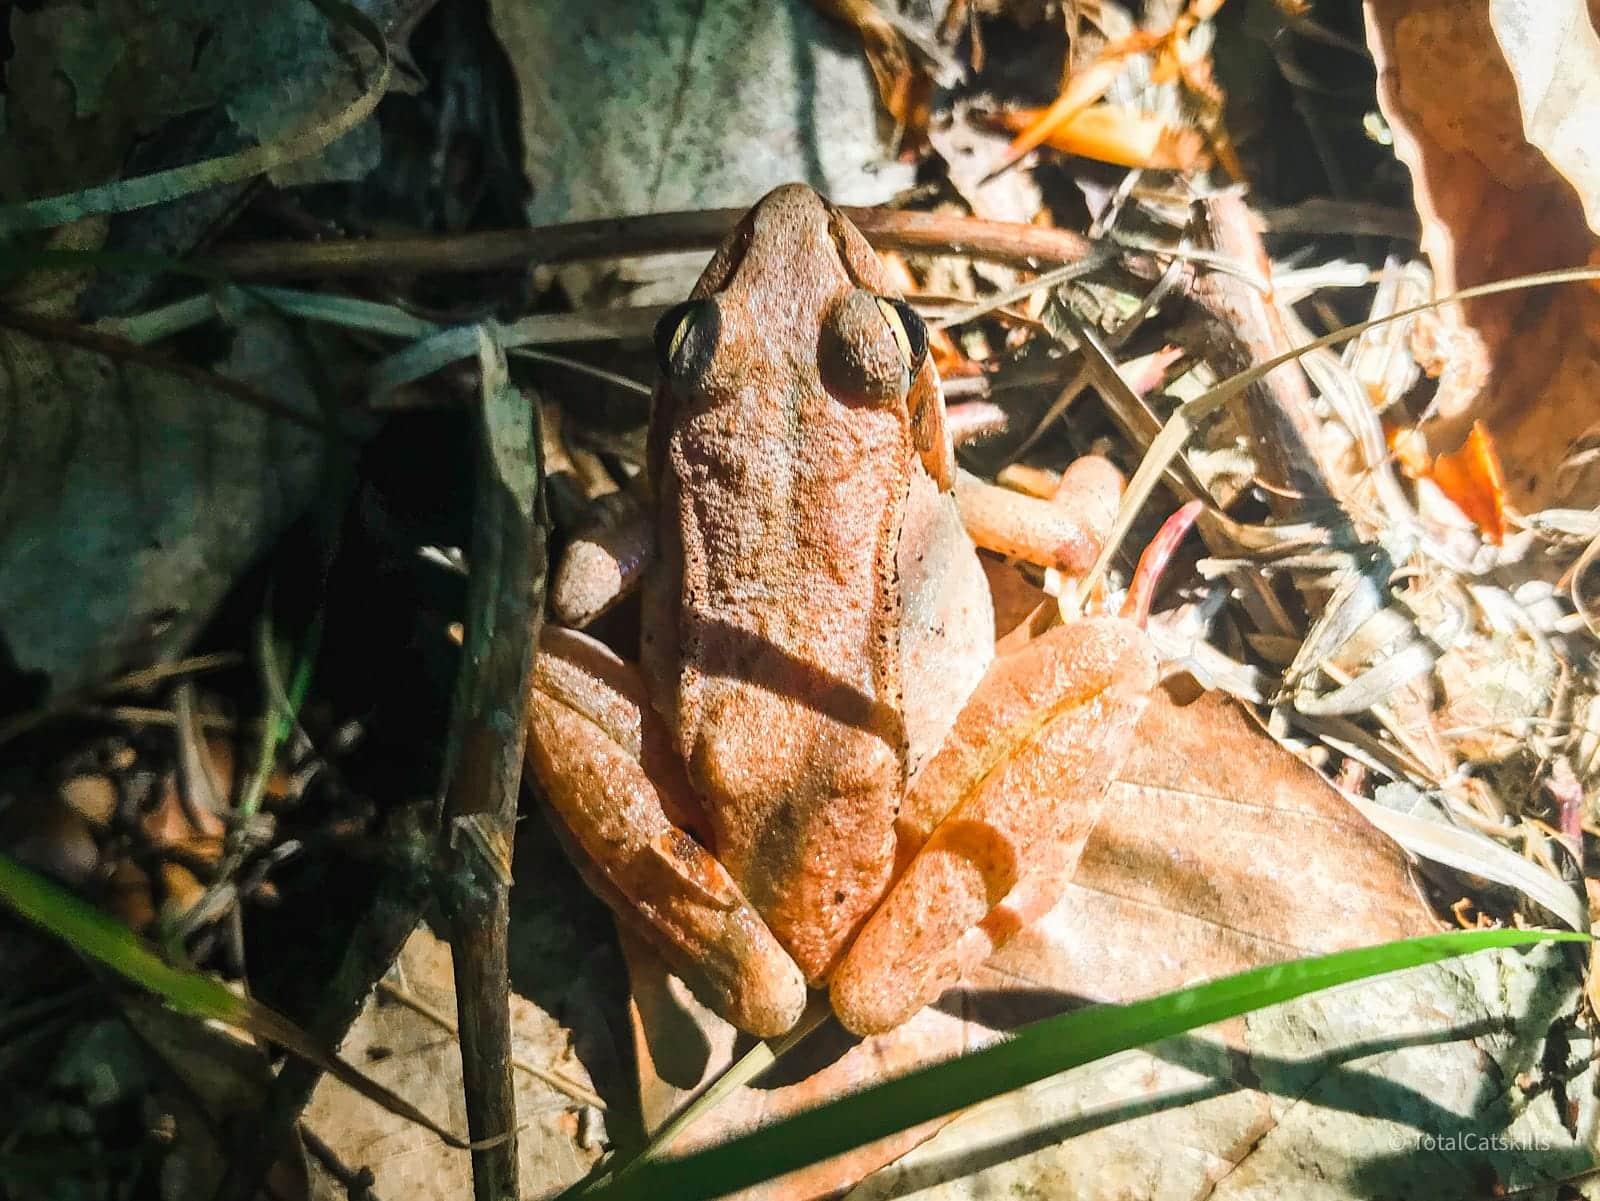 wood frog among grass and dried foliage